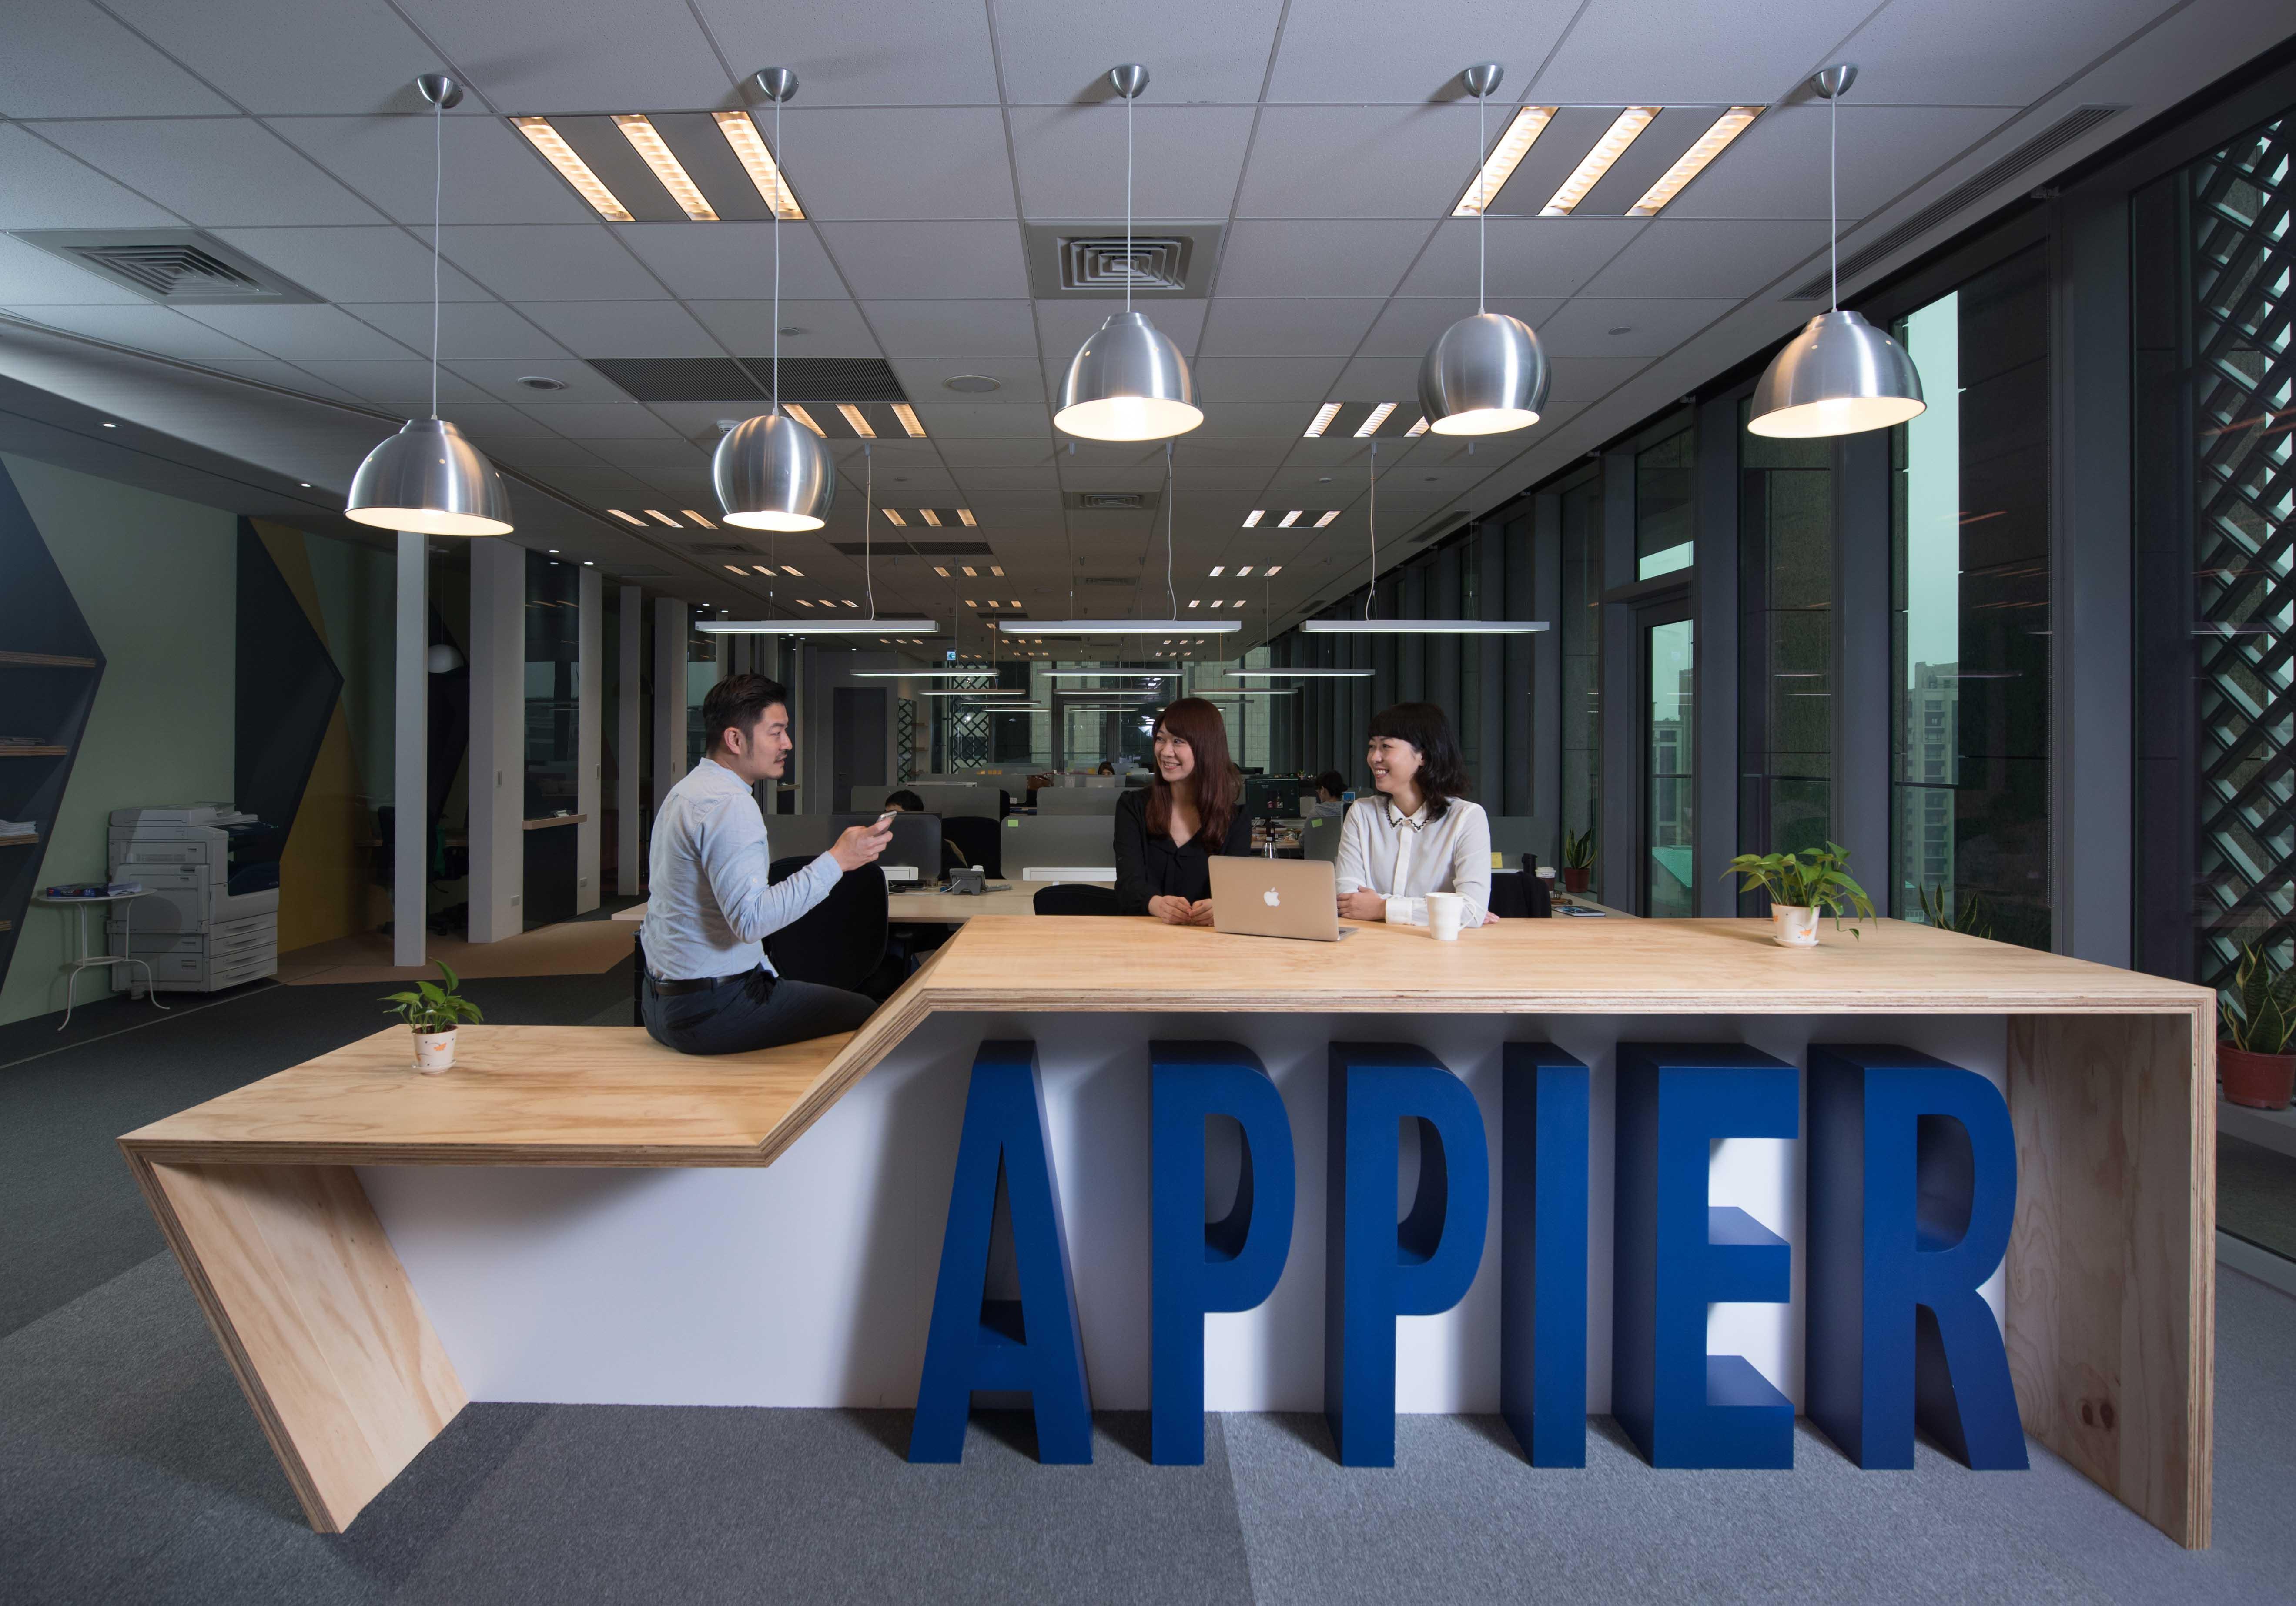 Appier辦公室:站立工作區